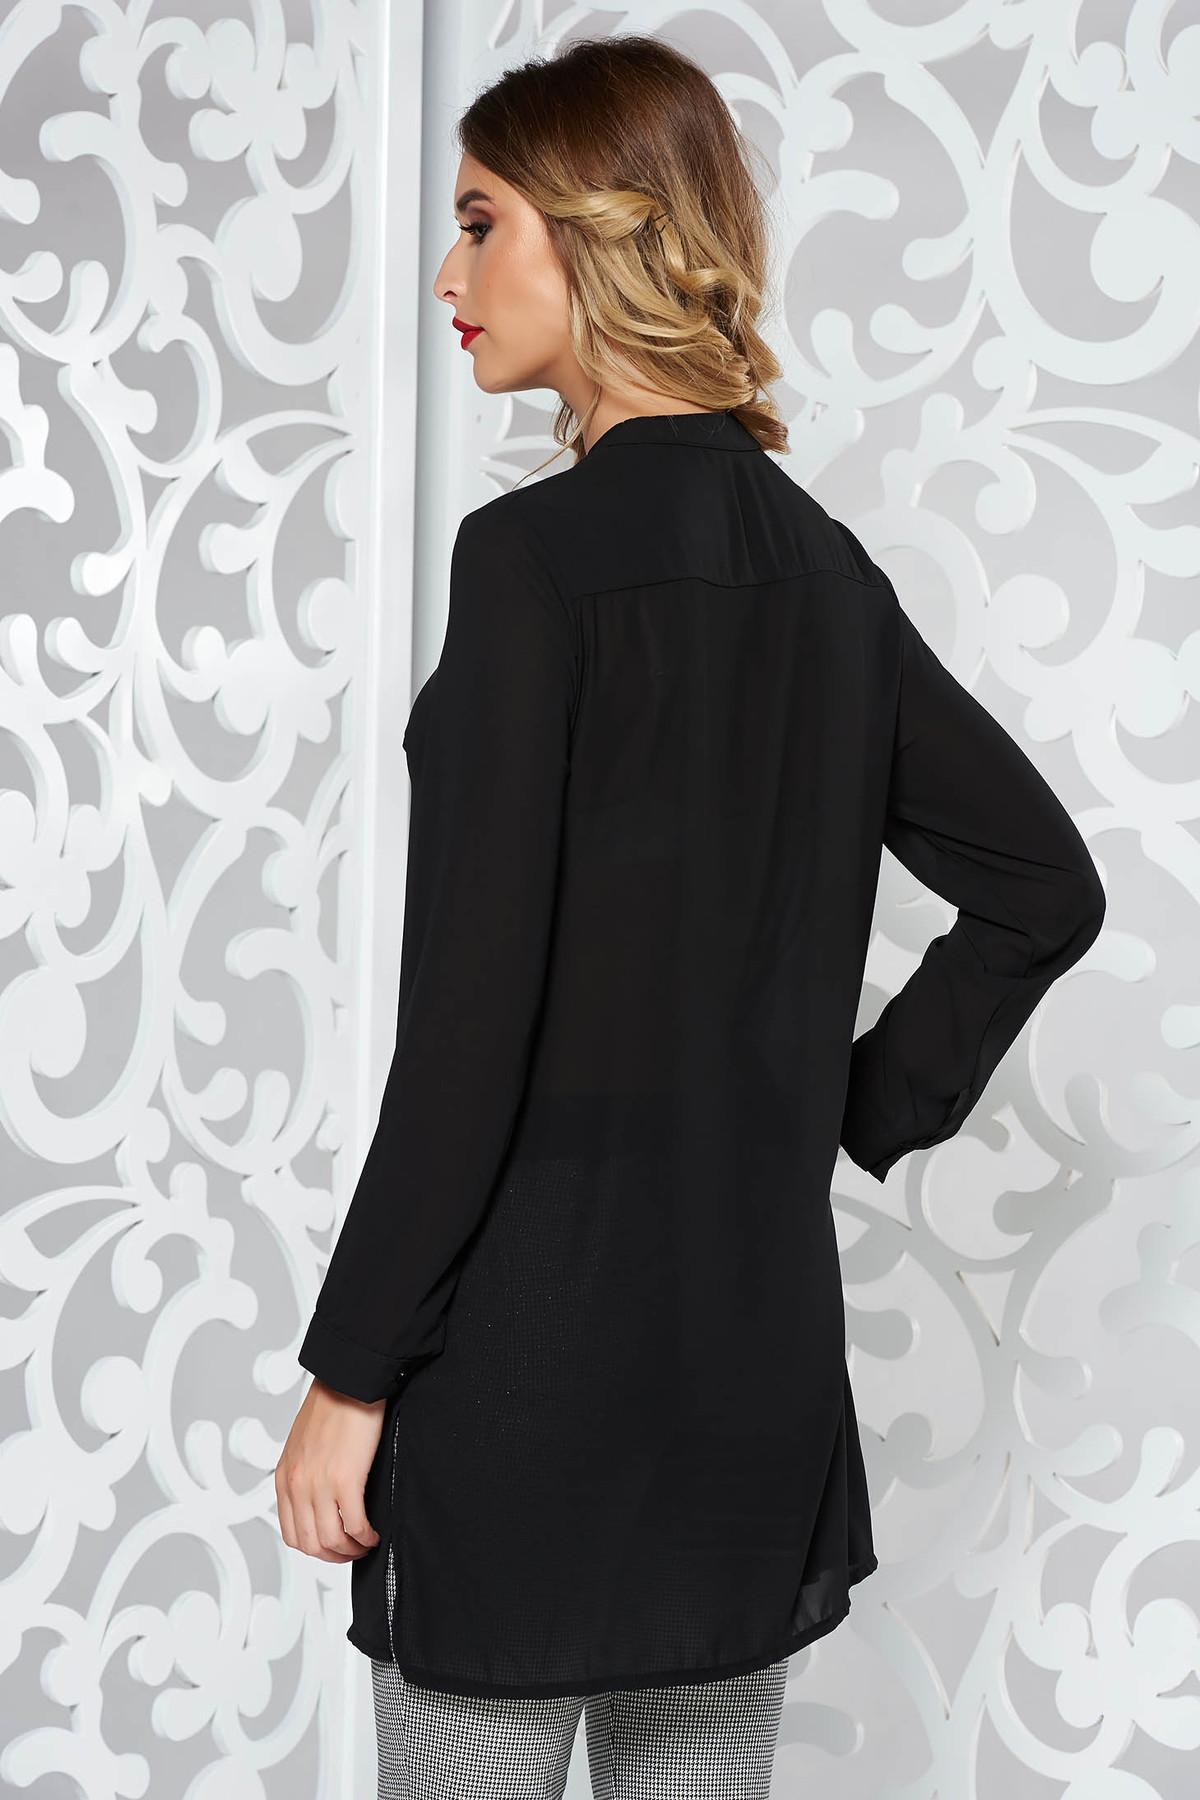 Camasa dama SunShine neagra eleganta cu croi larg din material usor transparent cu maneca lunga